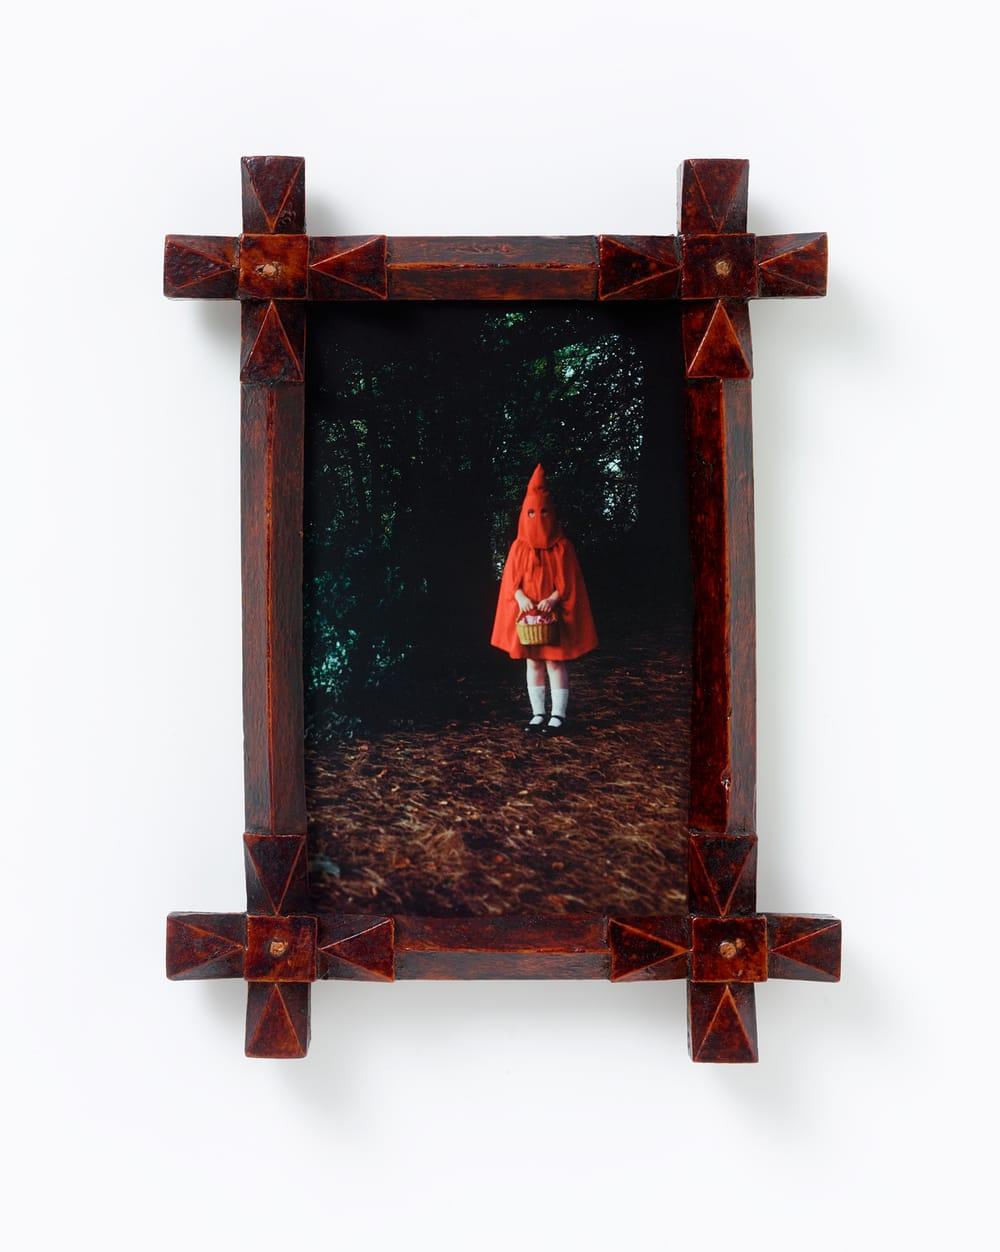 Nancy FOUTS, Red Riding Hood, 2011